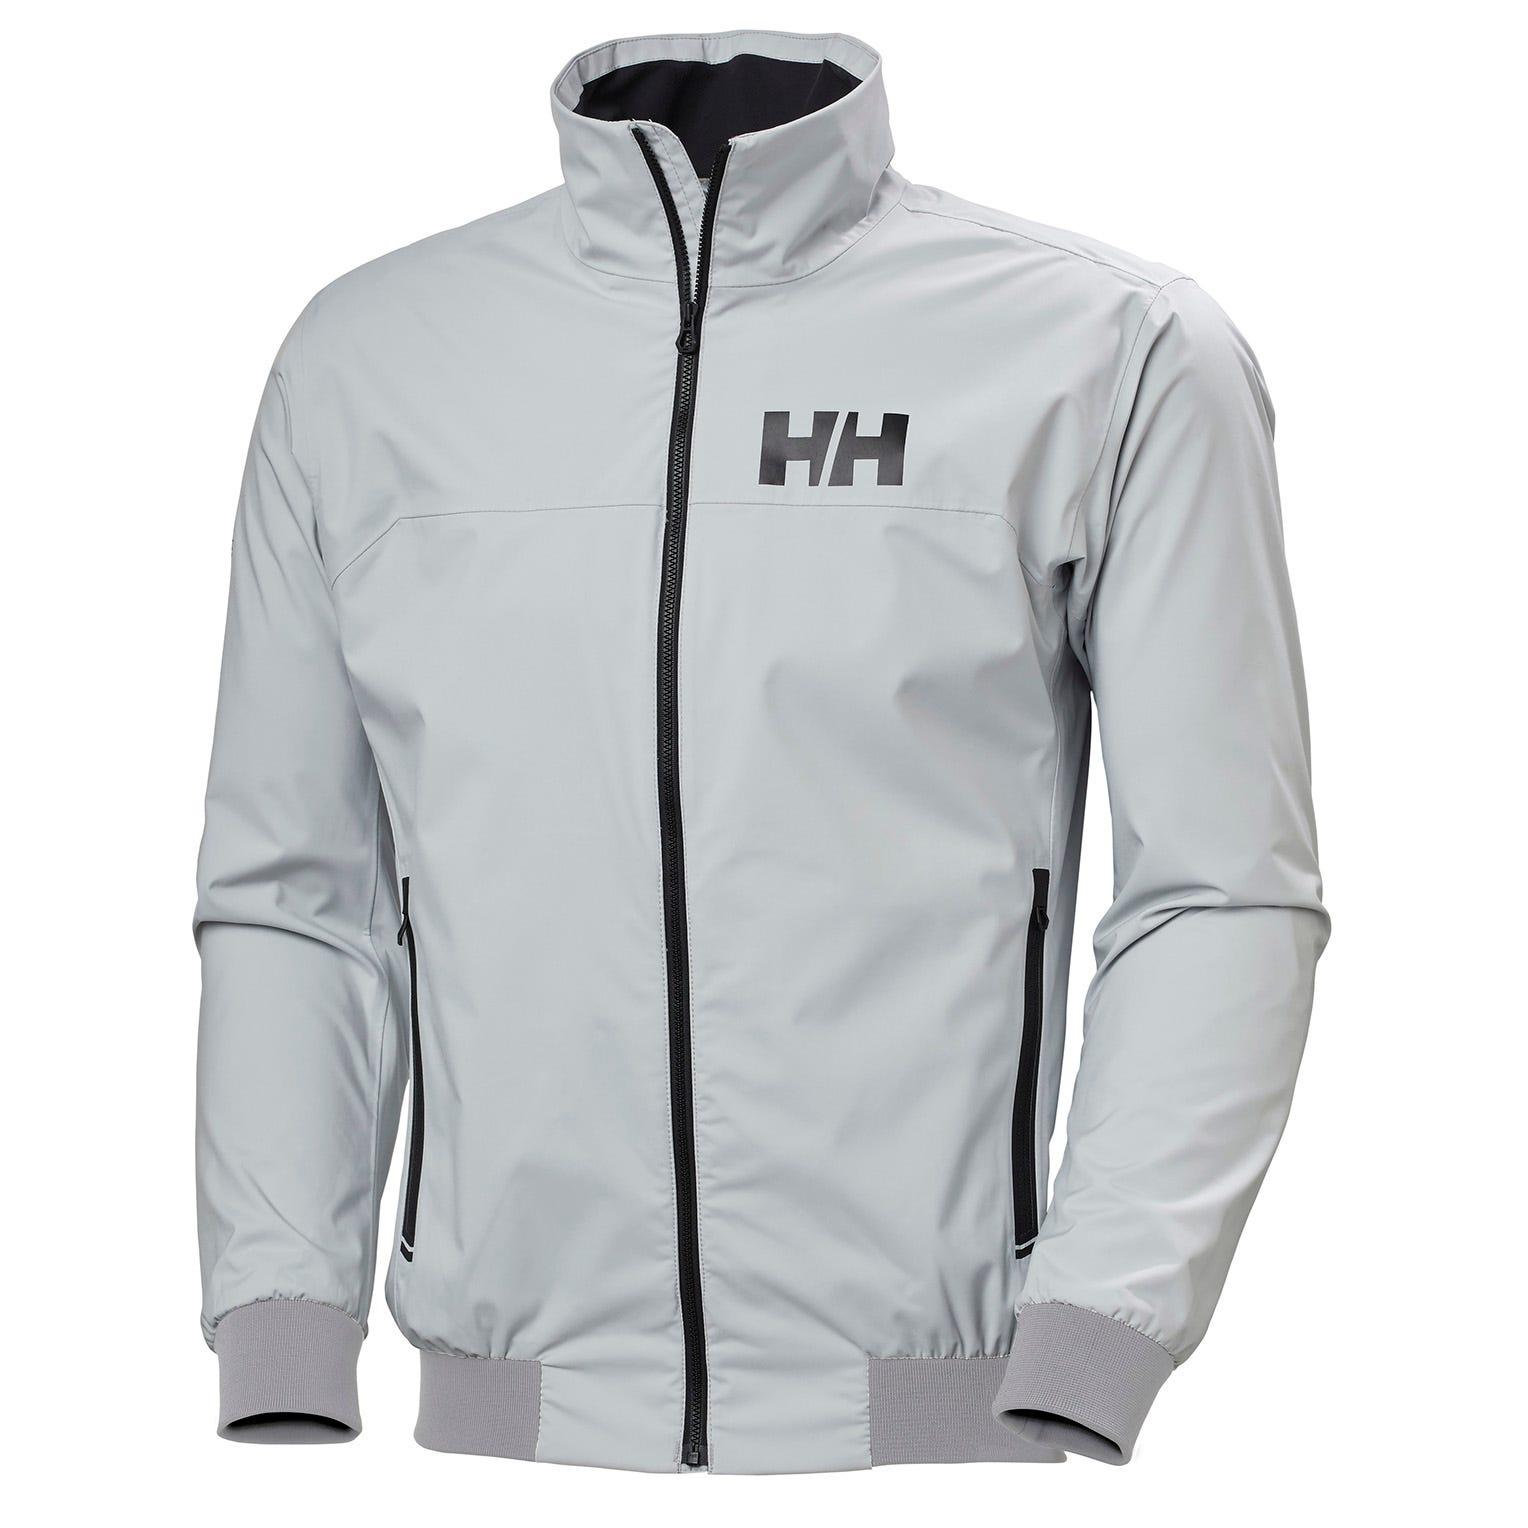 Helly Hansen Mens Hp Racing Lighweight Wind Jacket Grey XXL